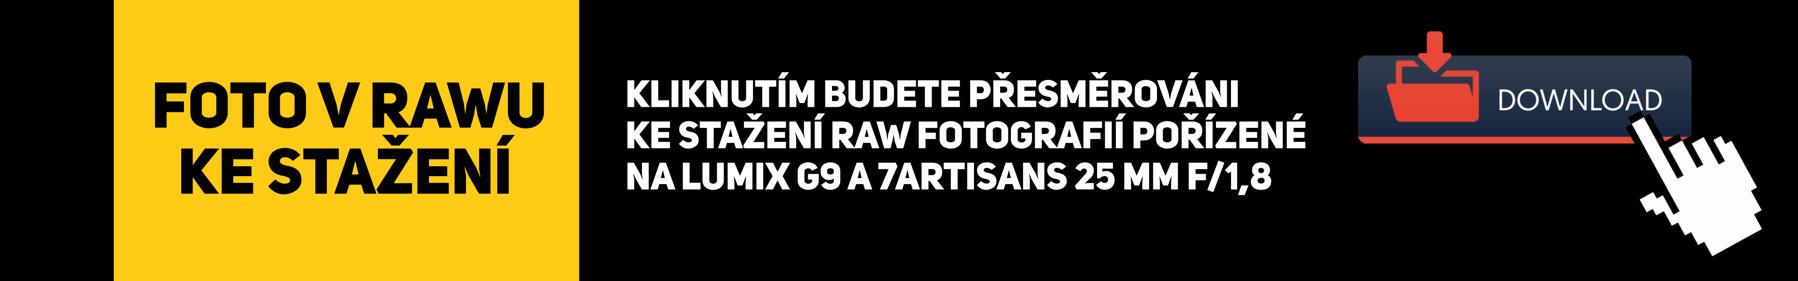 7artisans_test